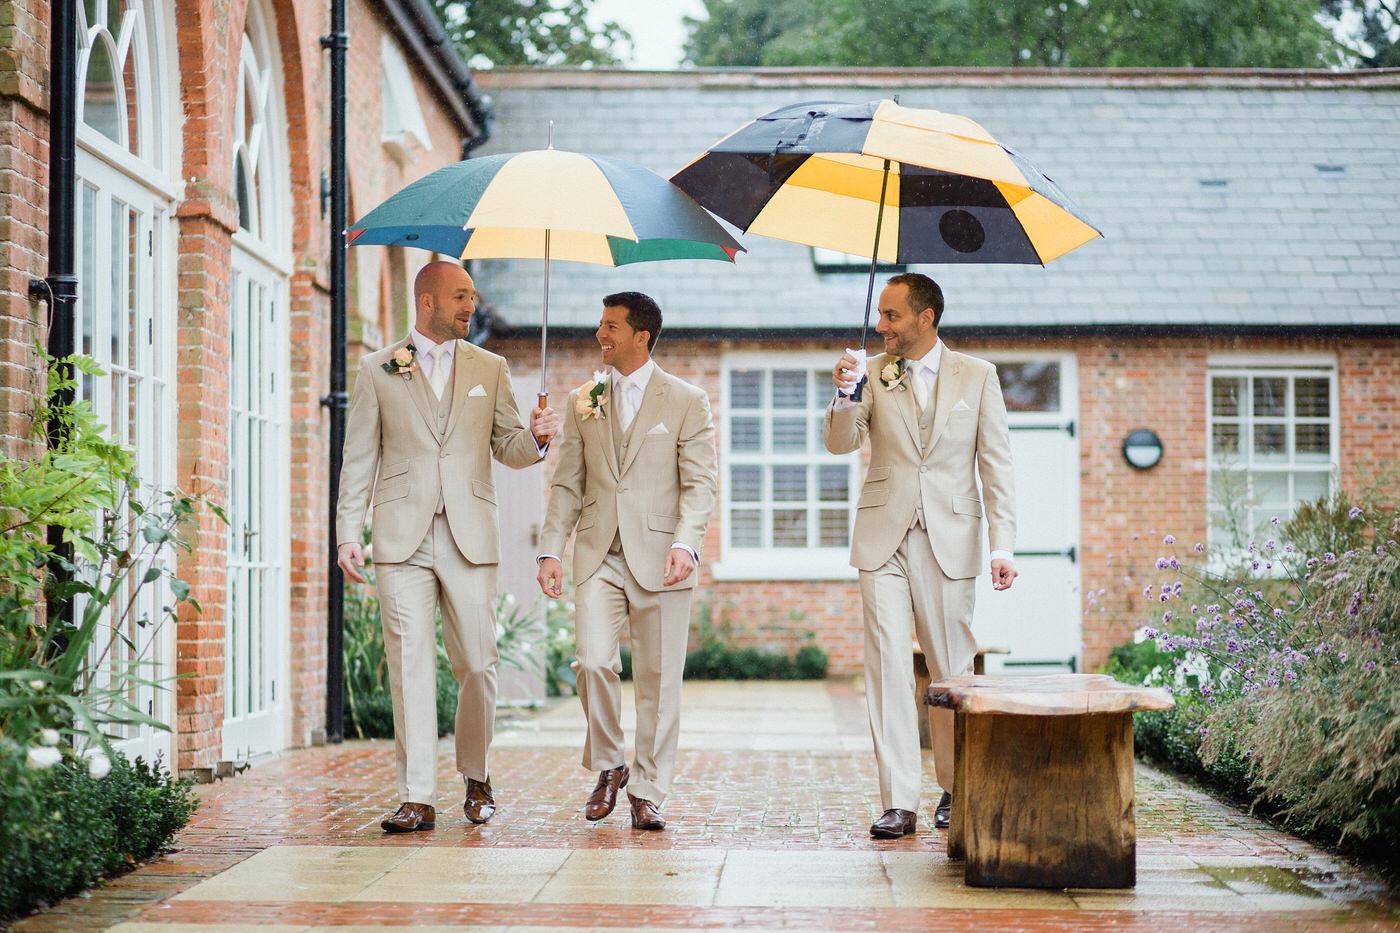 gaynes-park-wedding-photography-7.JPG